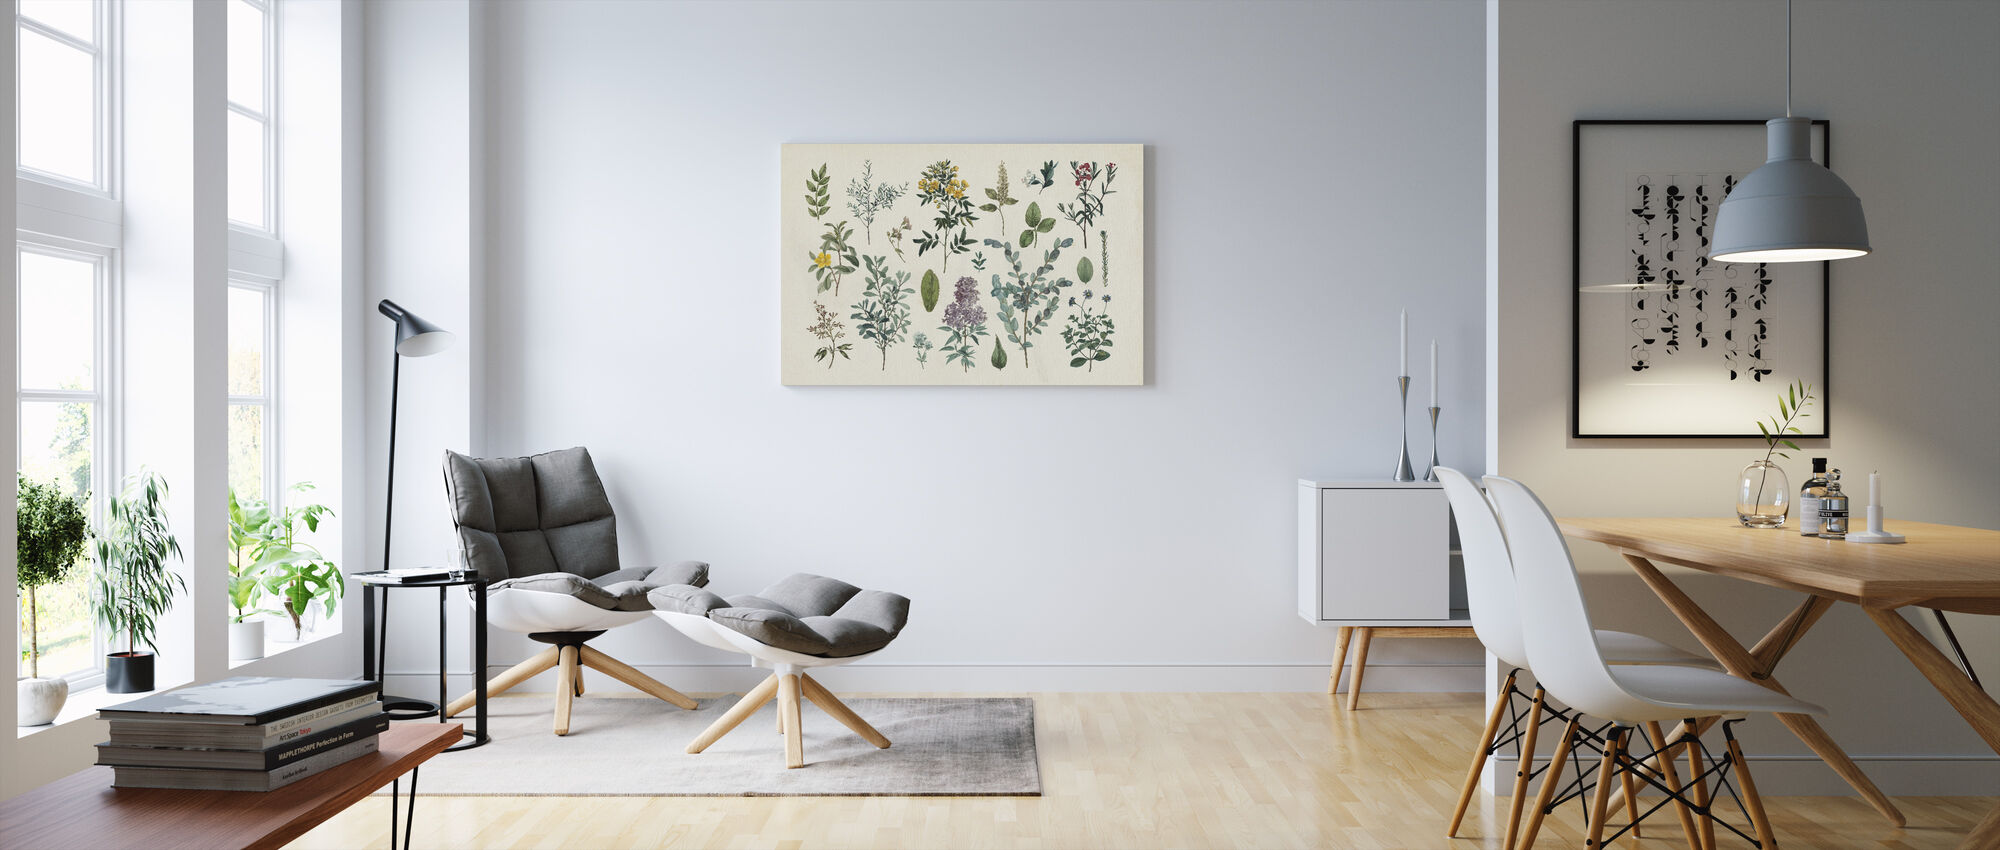 Victorian Garden IV - Canvas print - Living Room